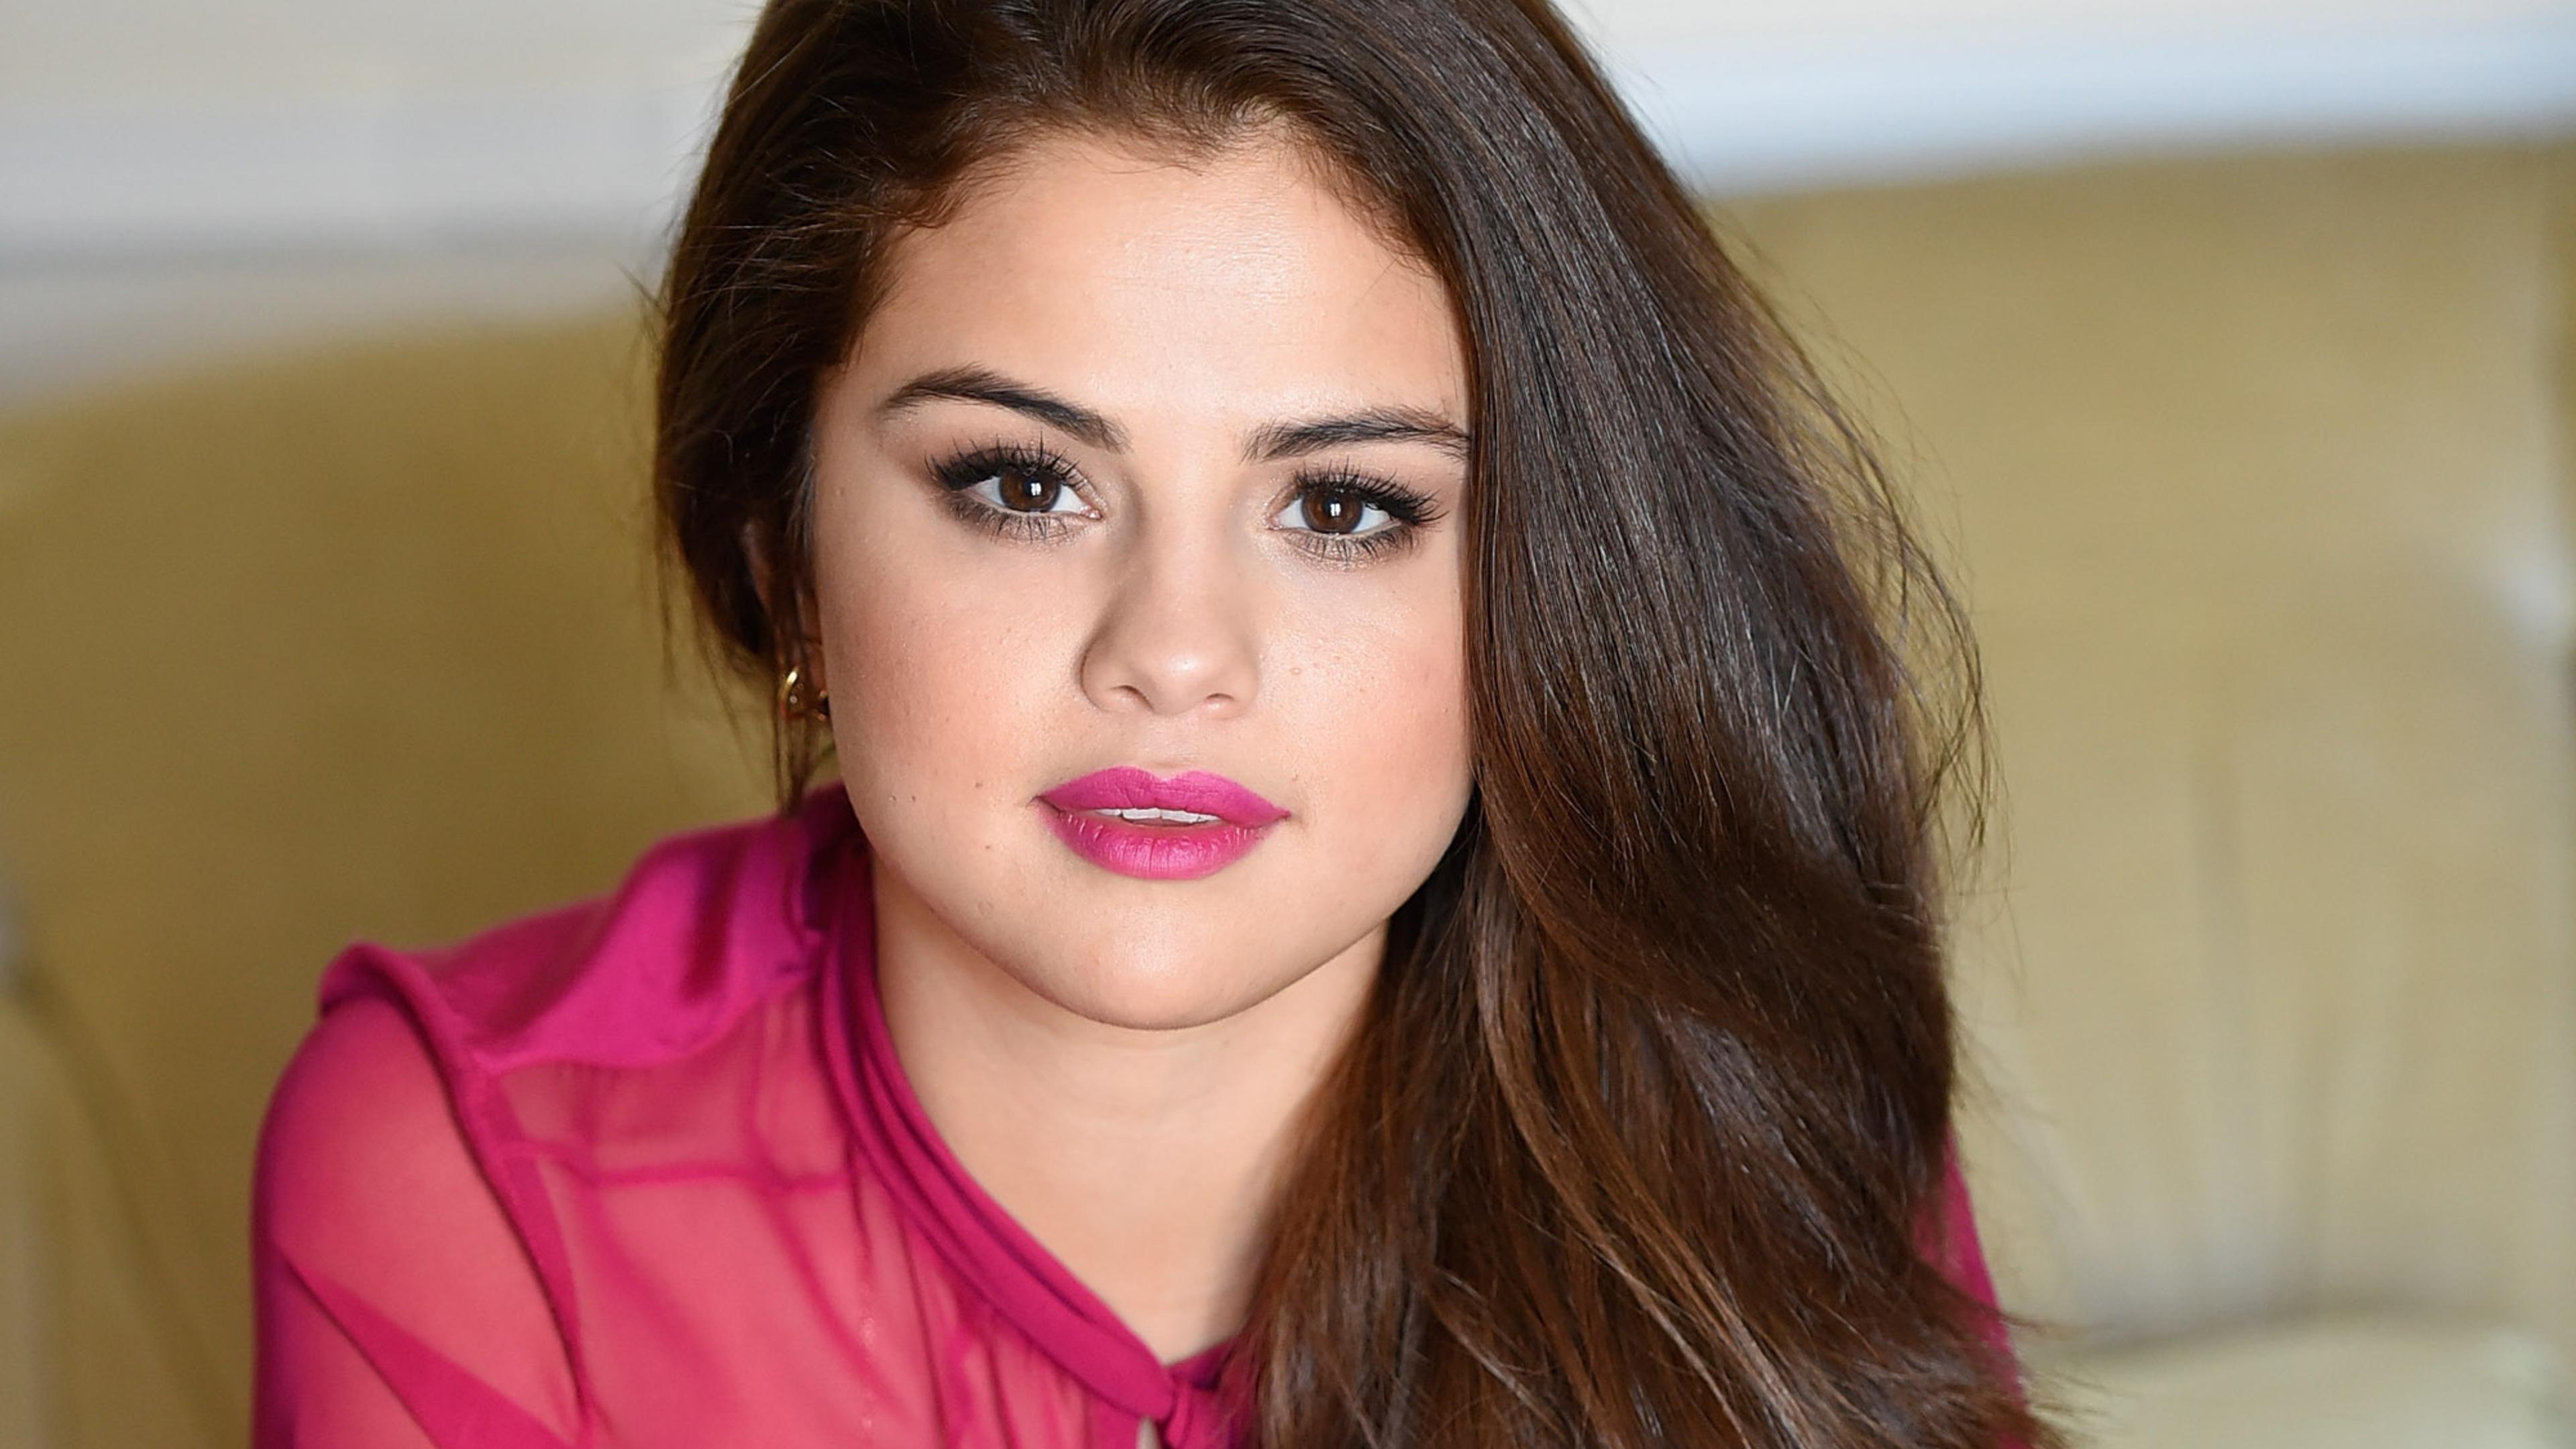 Gucci Mane Iphone Wallpaper Selena Gomez Beautiful 4k Wallpapers Hd Wallpapers Id